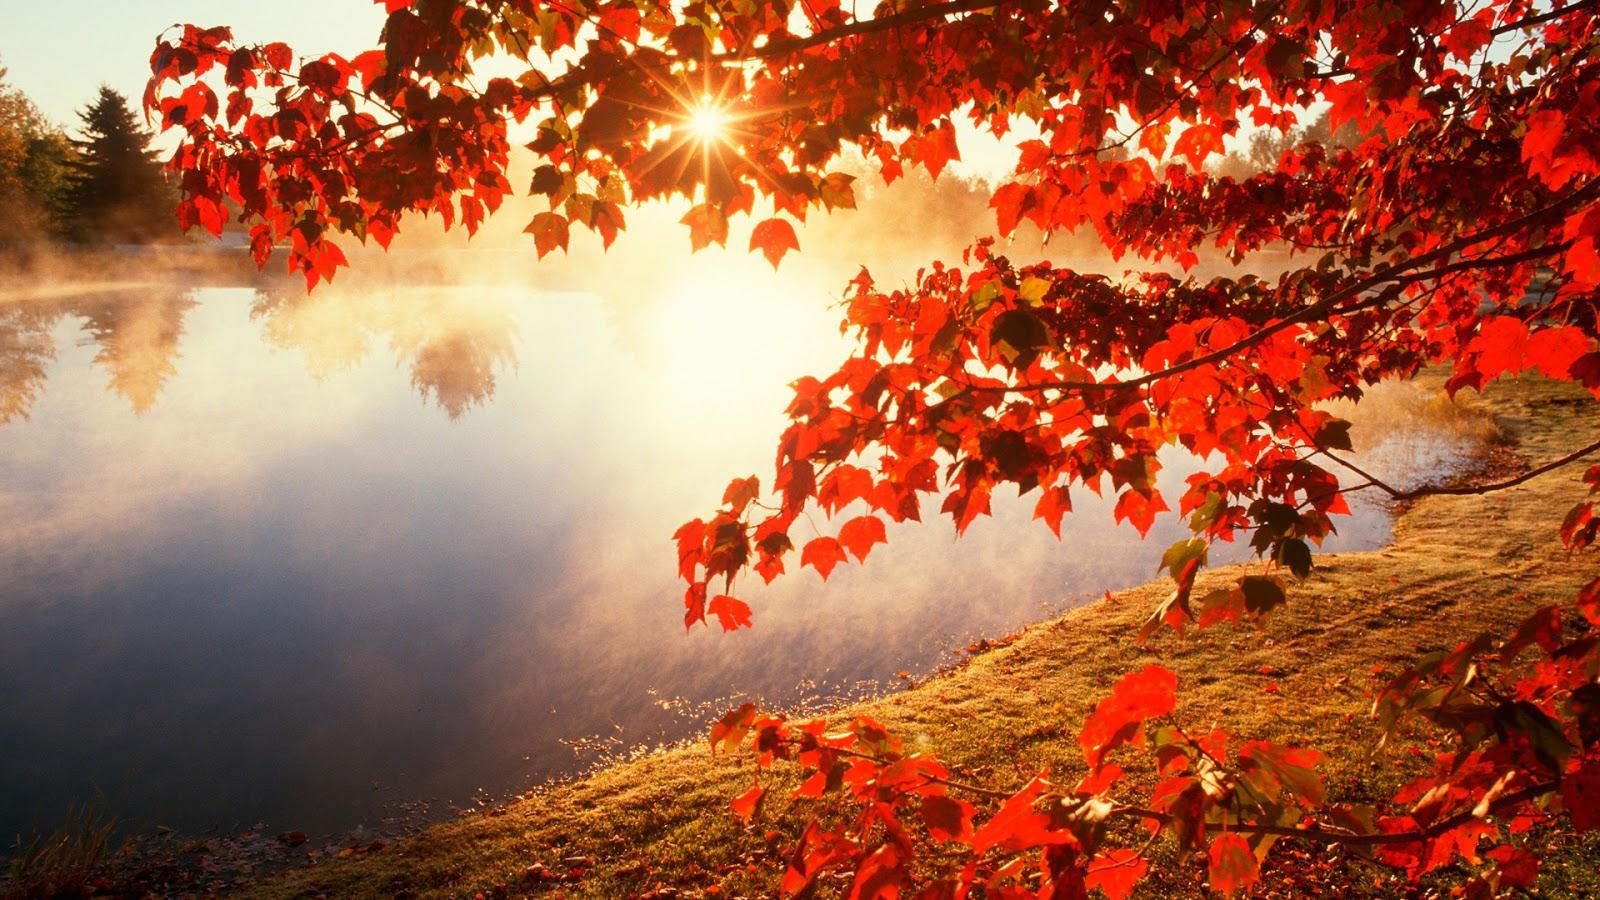 http://4.bp.blogspot.com/-jObInwj__3U/VEPSvoPyZoI/AAAAAAAAFJs/fmVJBvqFeWU/s1600/Red-autumn-morning.jpg